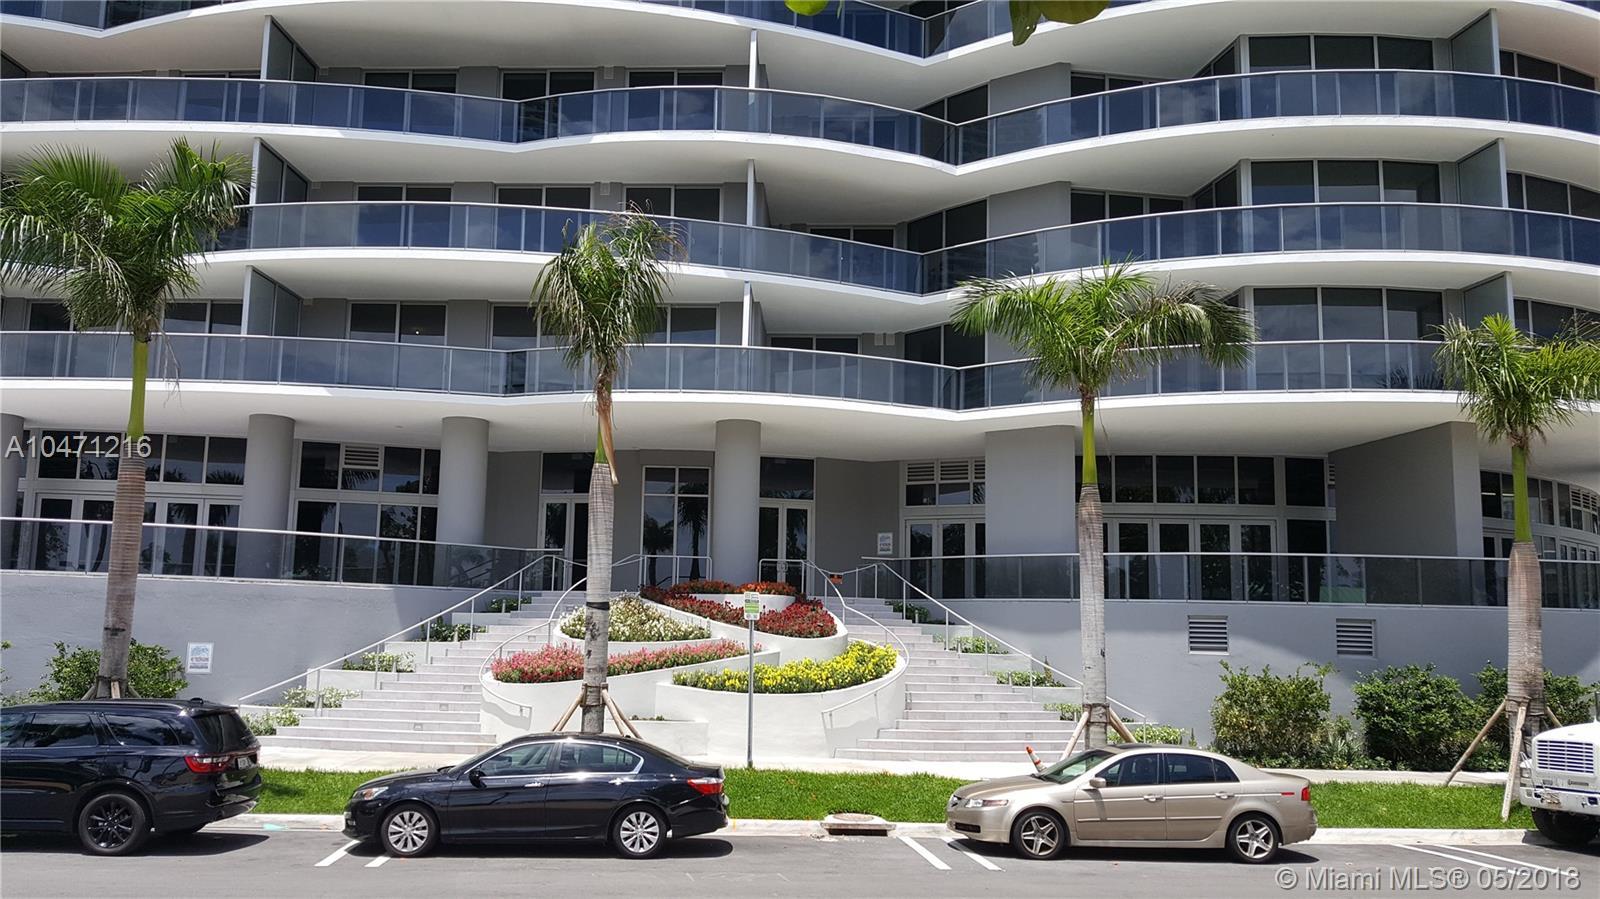 1770 N Bayshore Dr CU-3, Miami, FL 33132